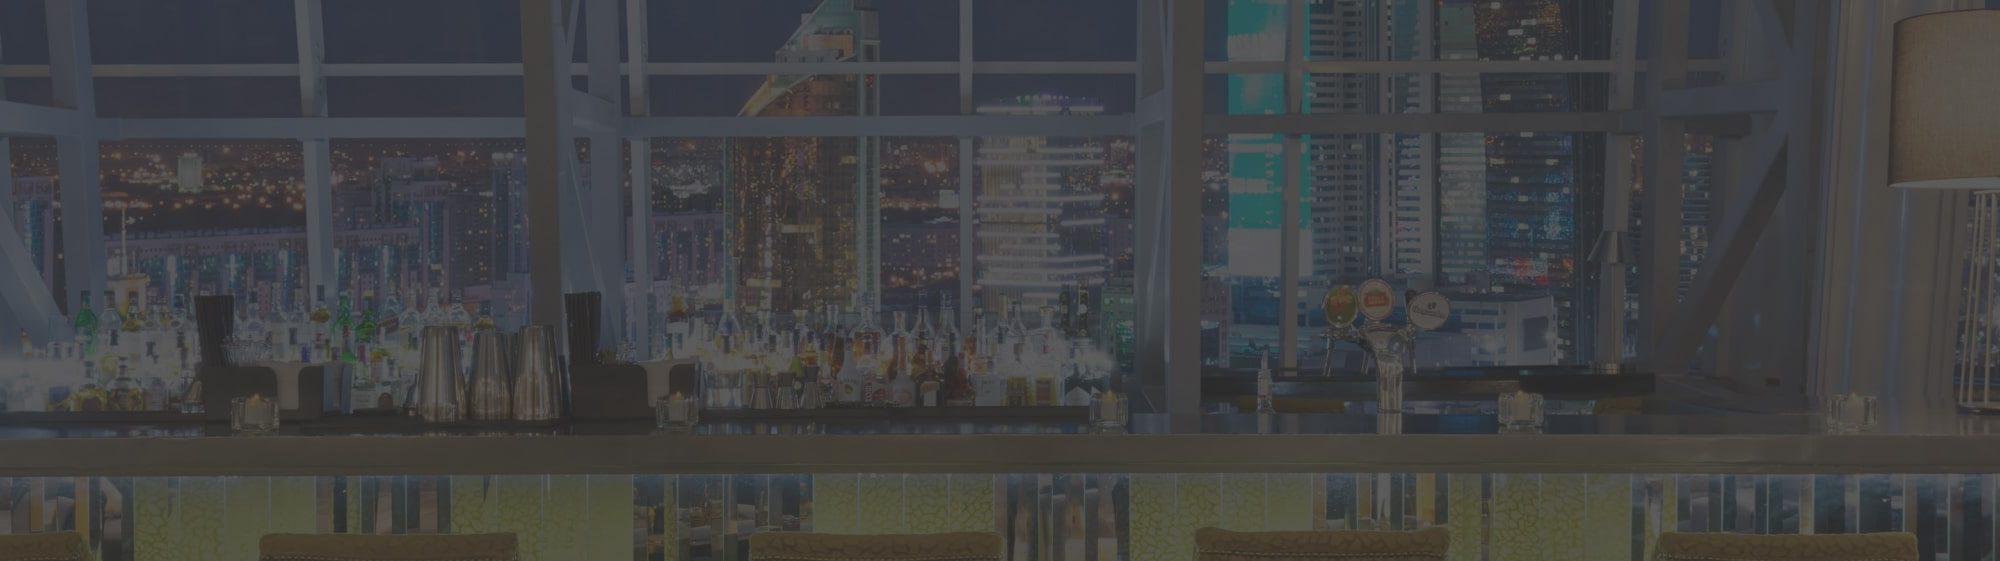 usercase-bottleworld-heading-min